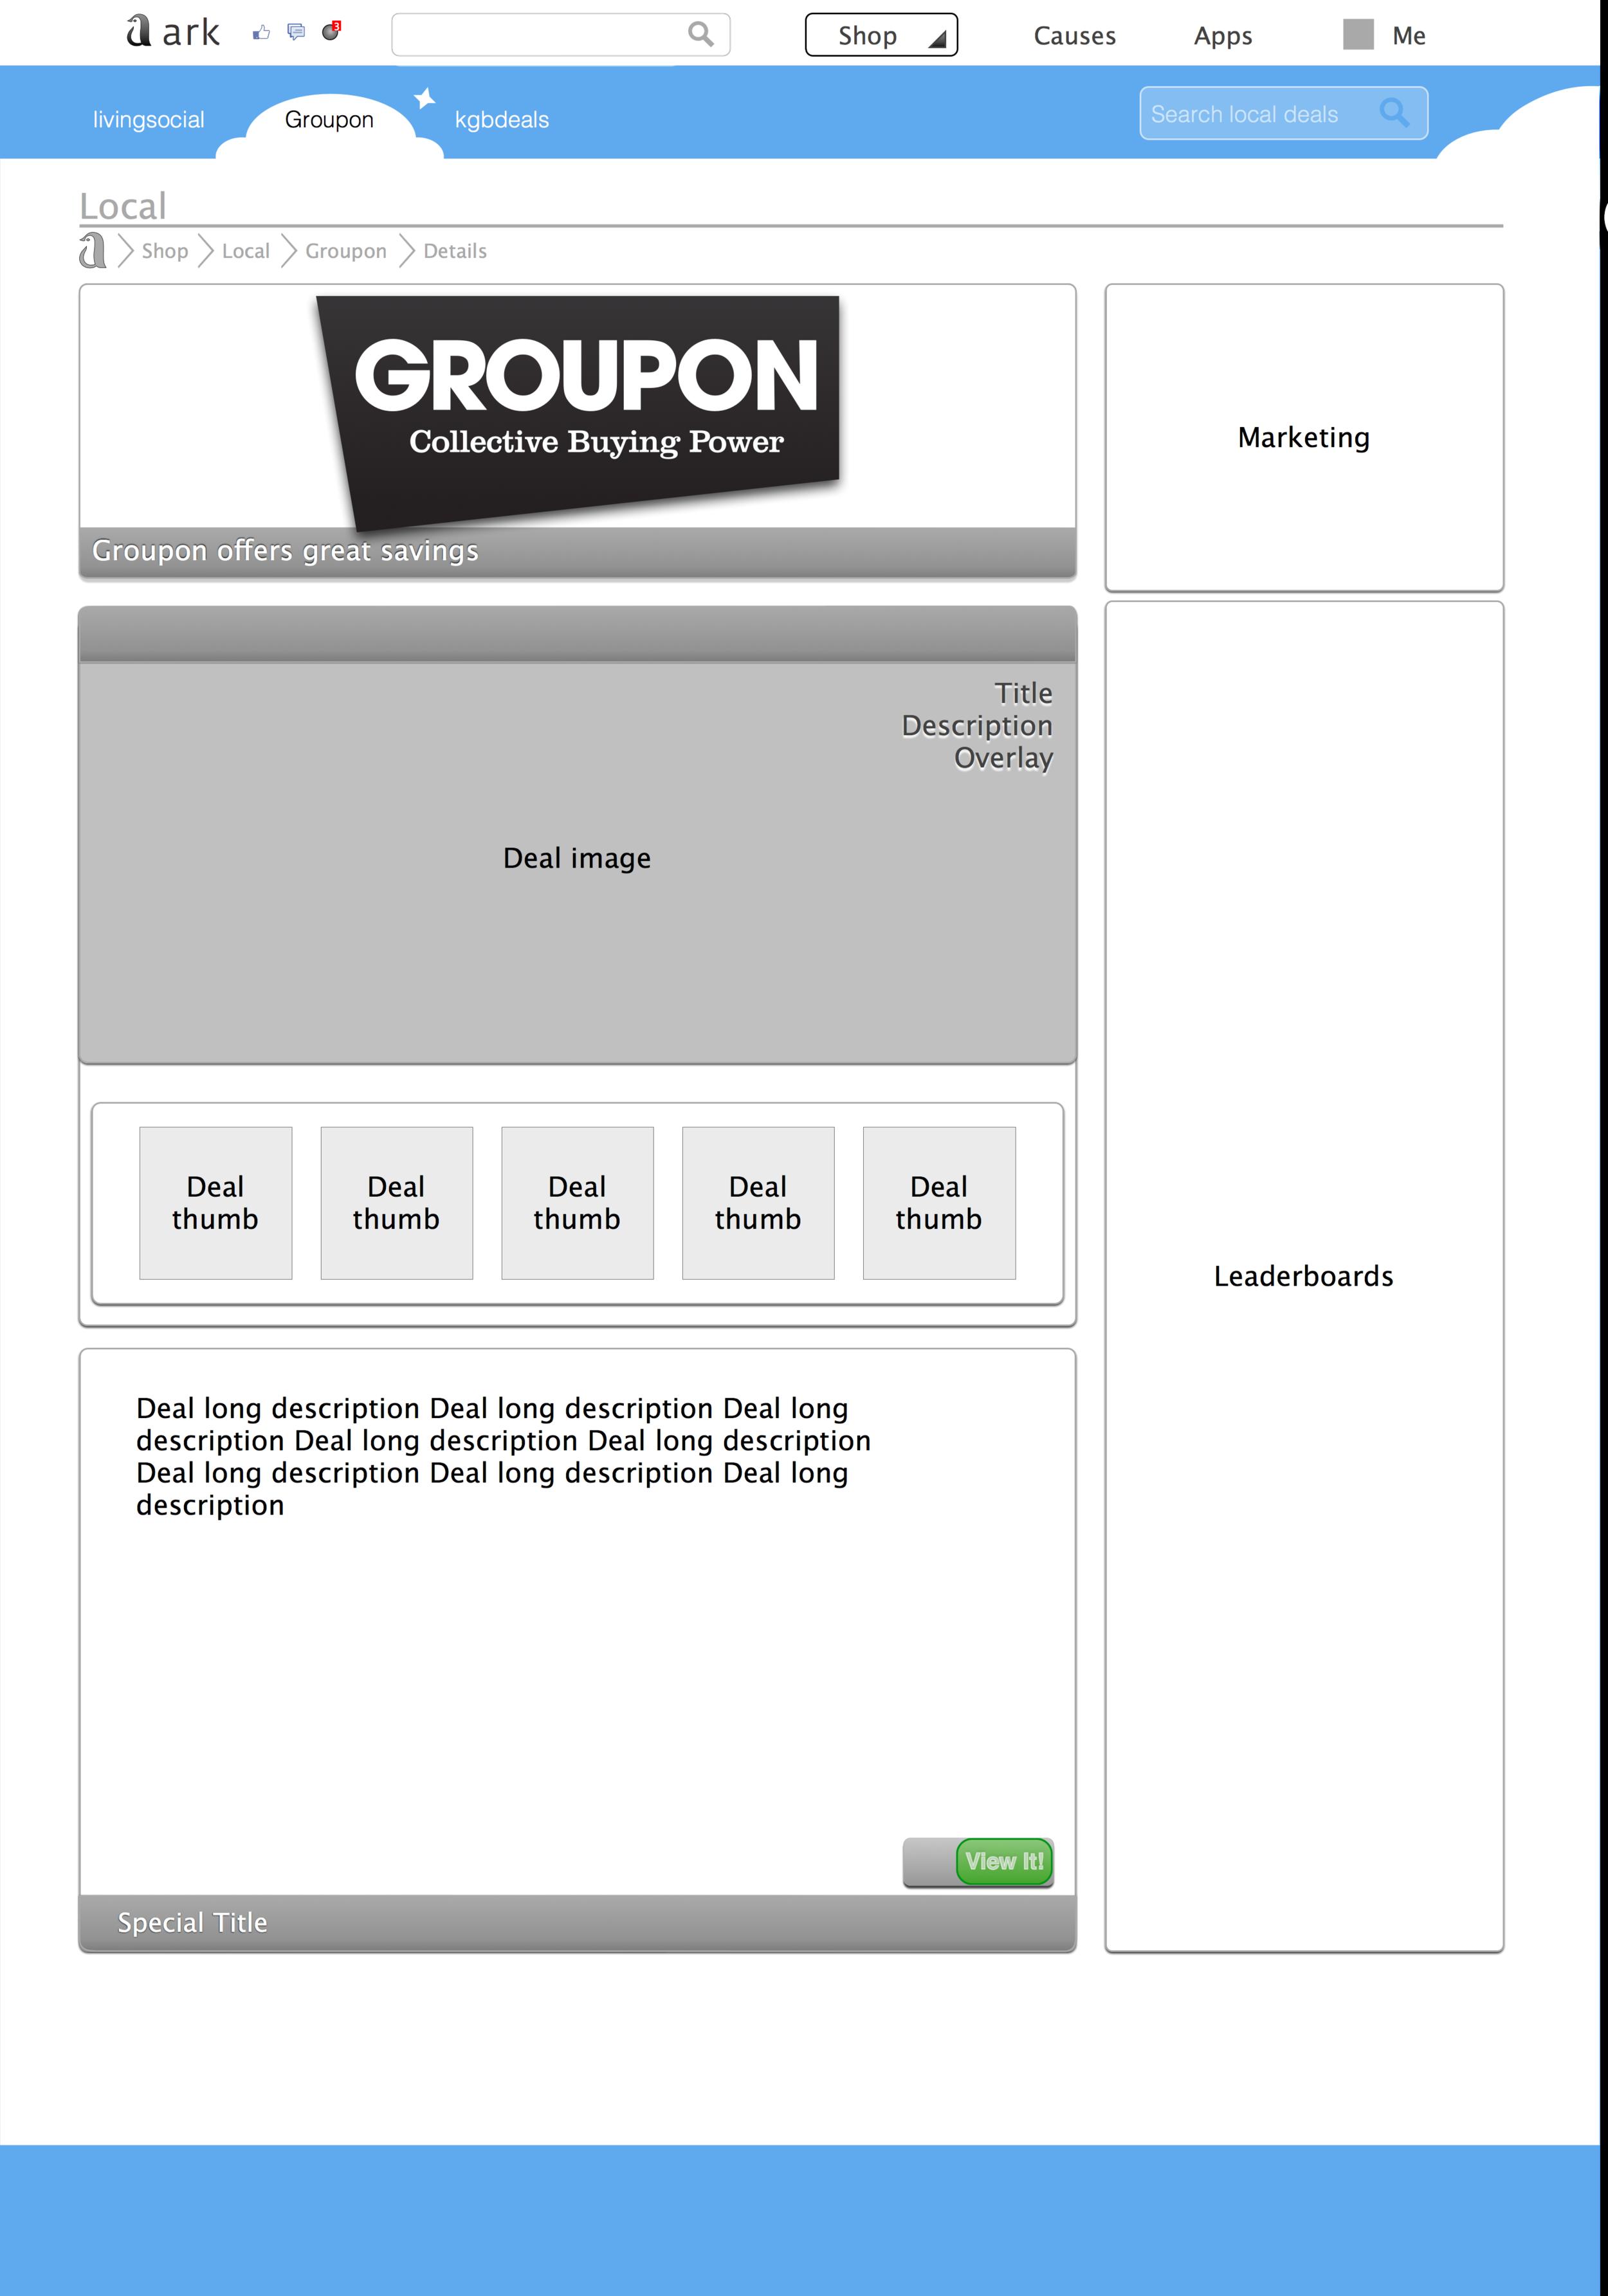 Groupon Details